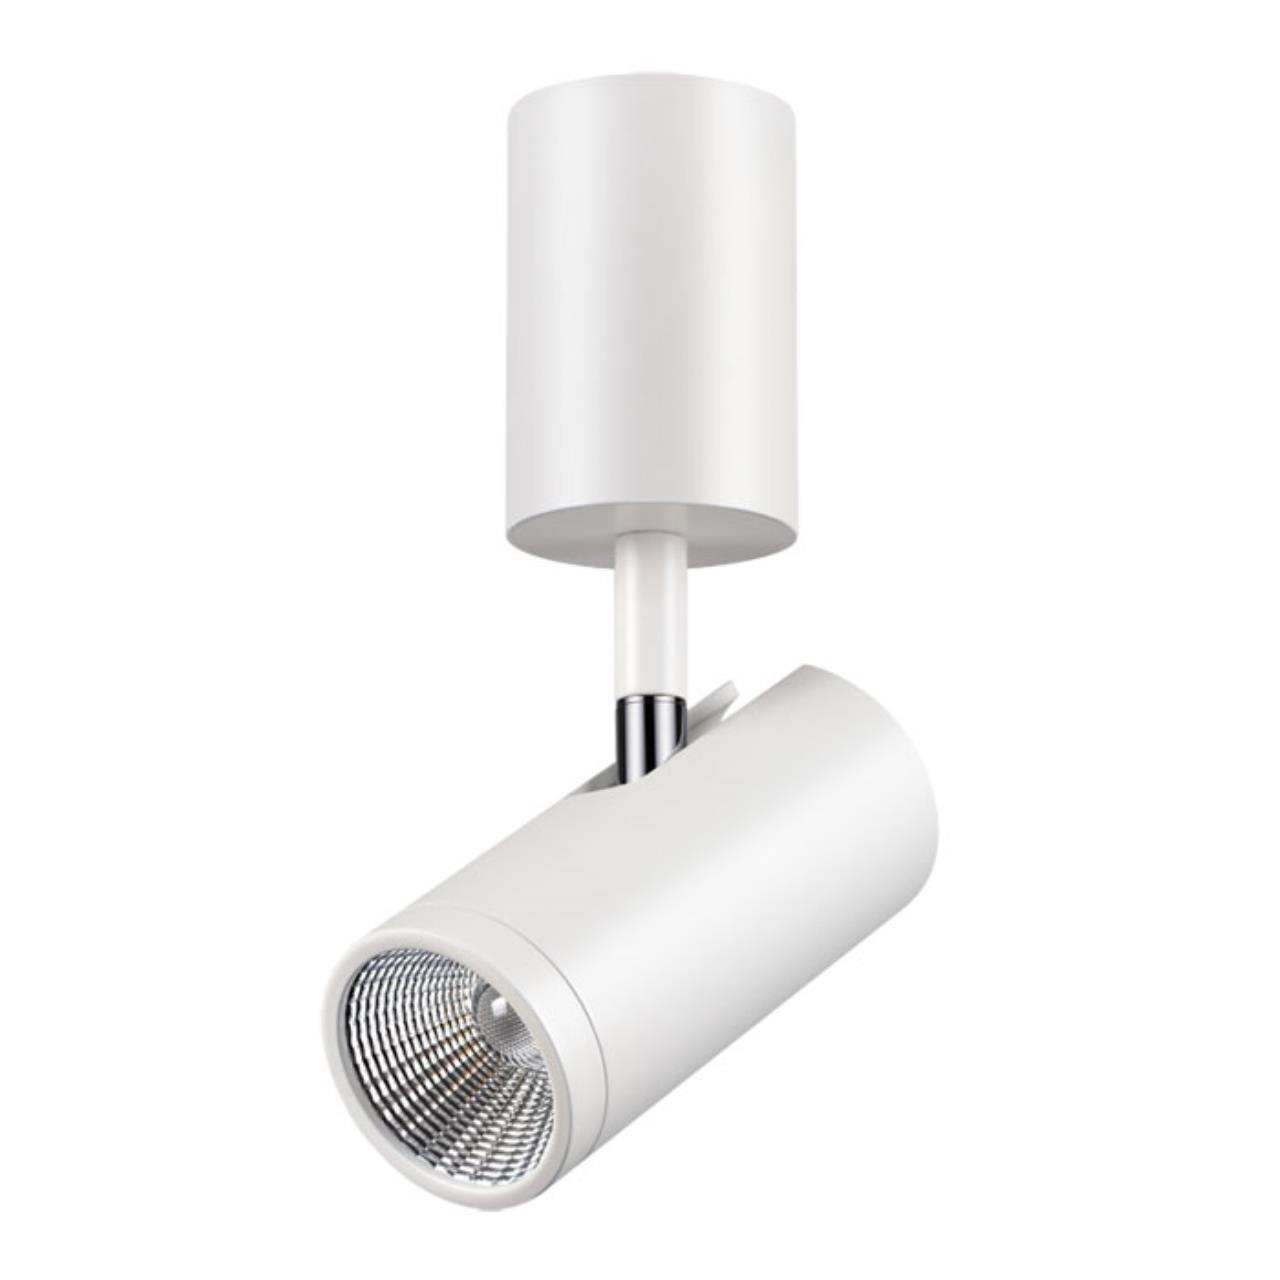 357467 OVER NT18 074 матовый белый Накладной светильник IP20 LED 3000K 7W 100-240V TUBO